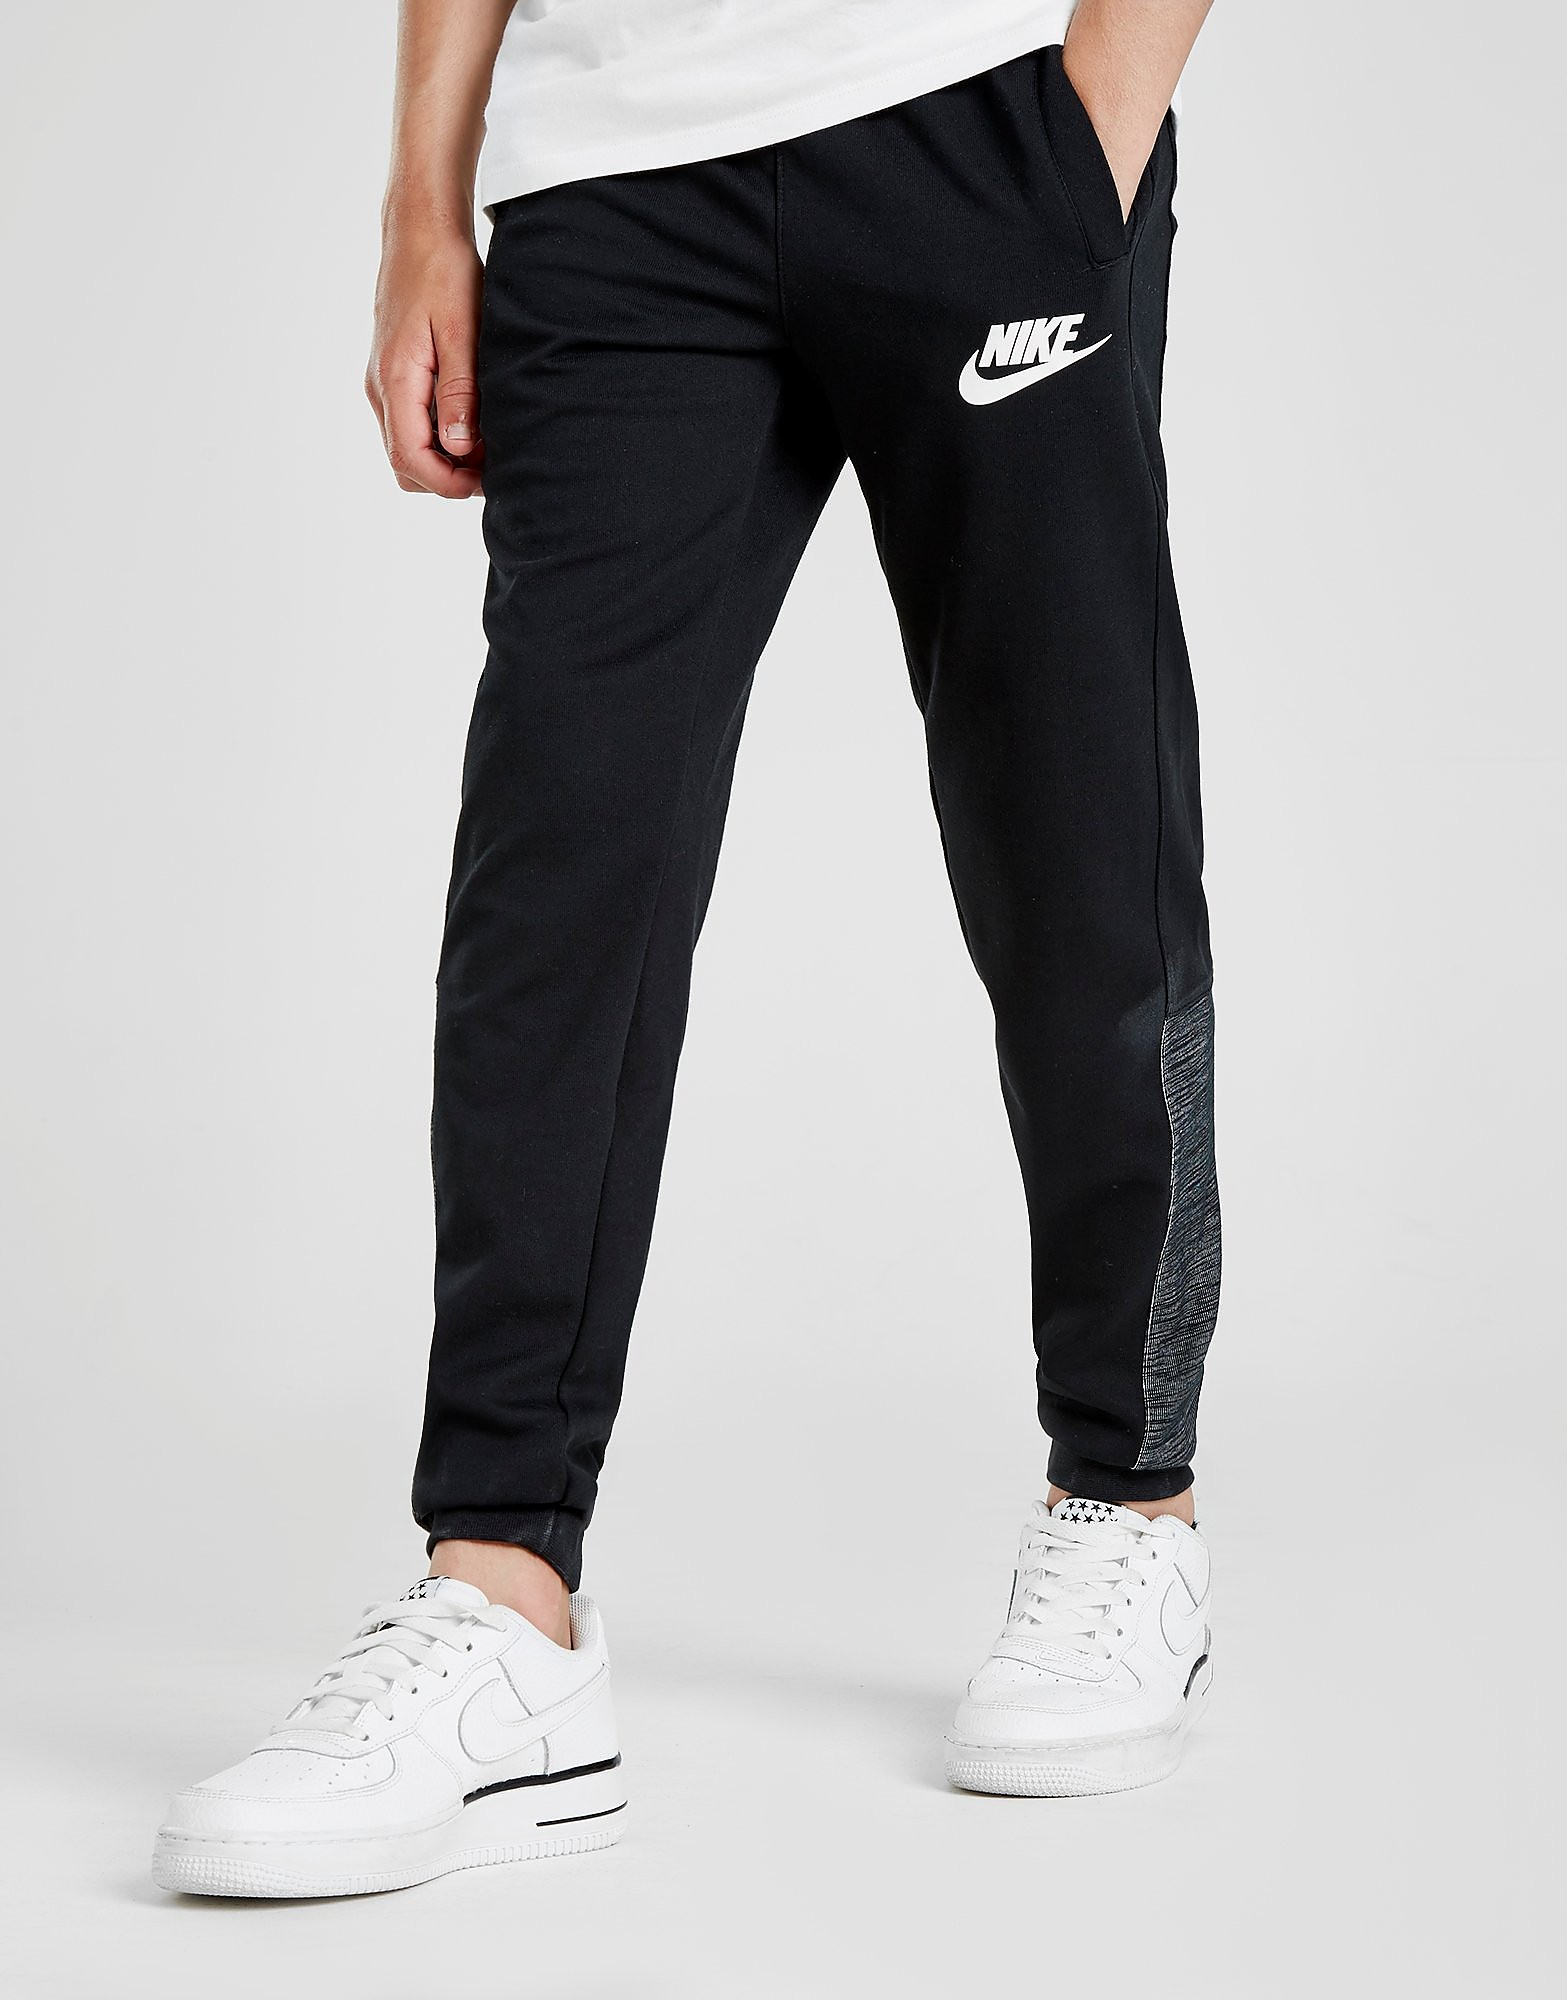 Nike Advance Fleece Pants Junior - Zwart - Kind